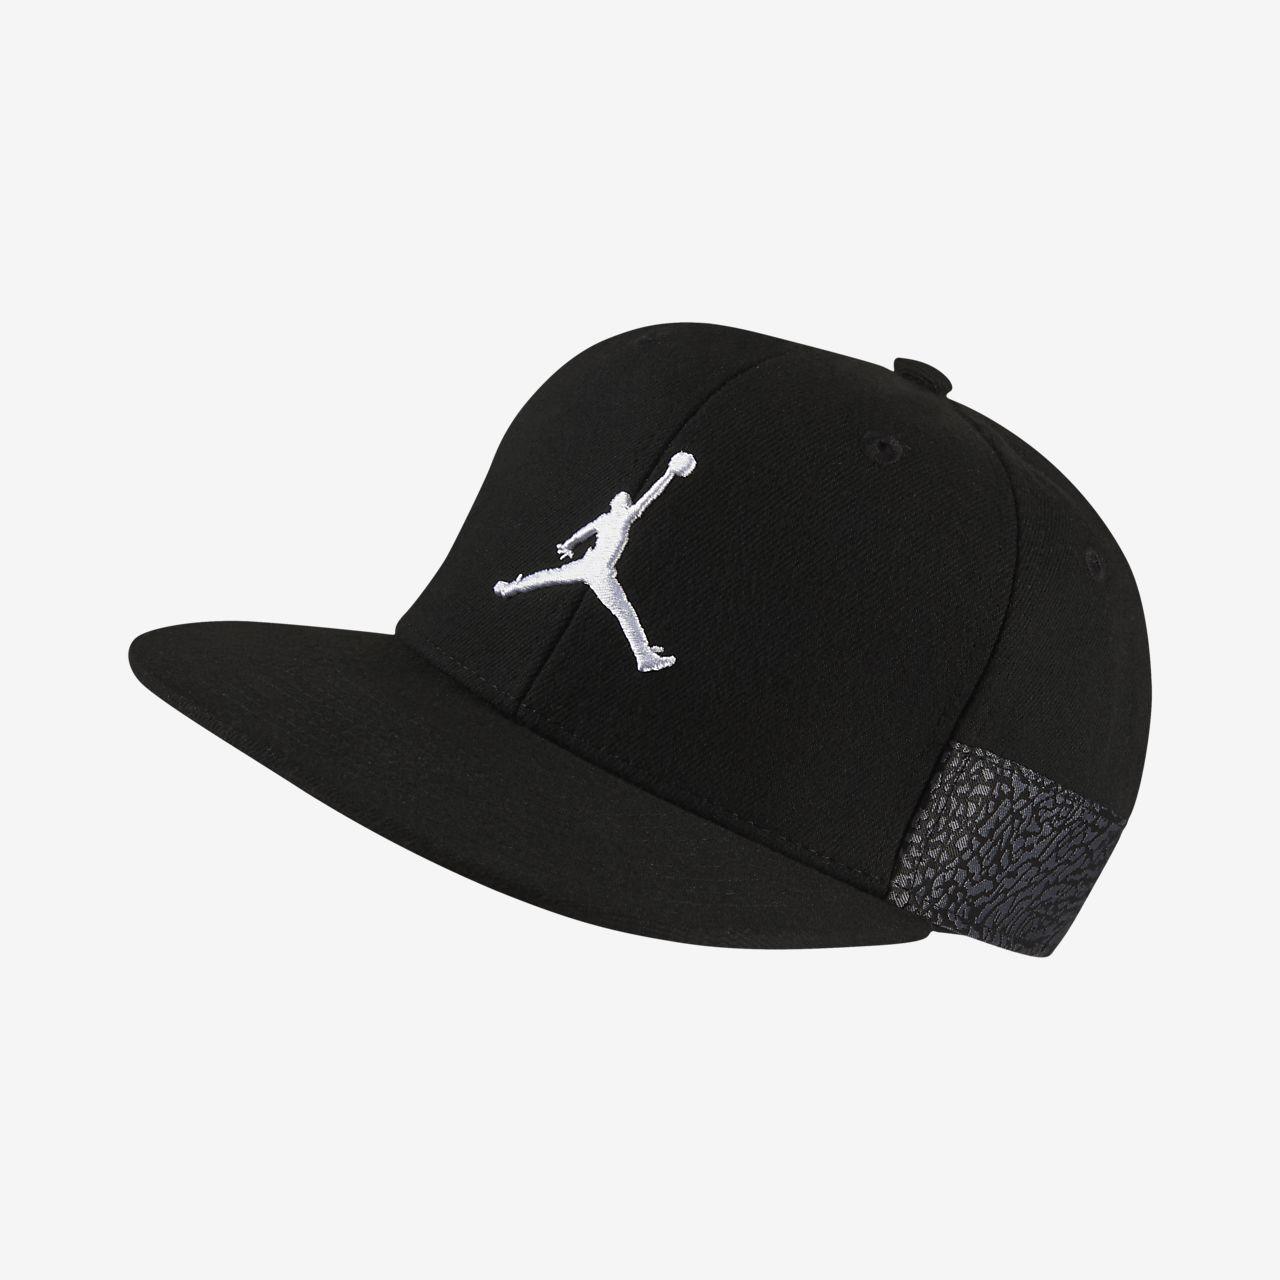 Jordan 3 儿童可调节运动帽